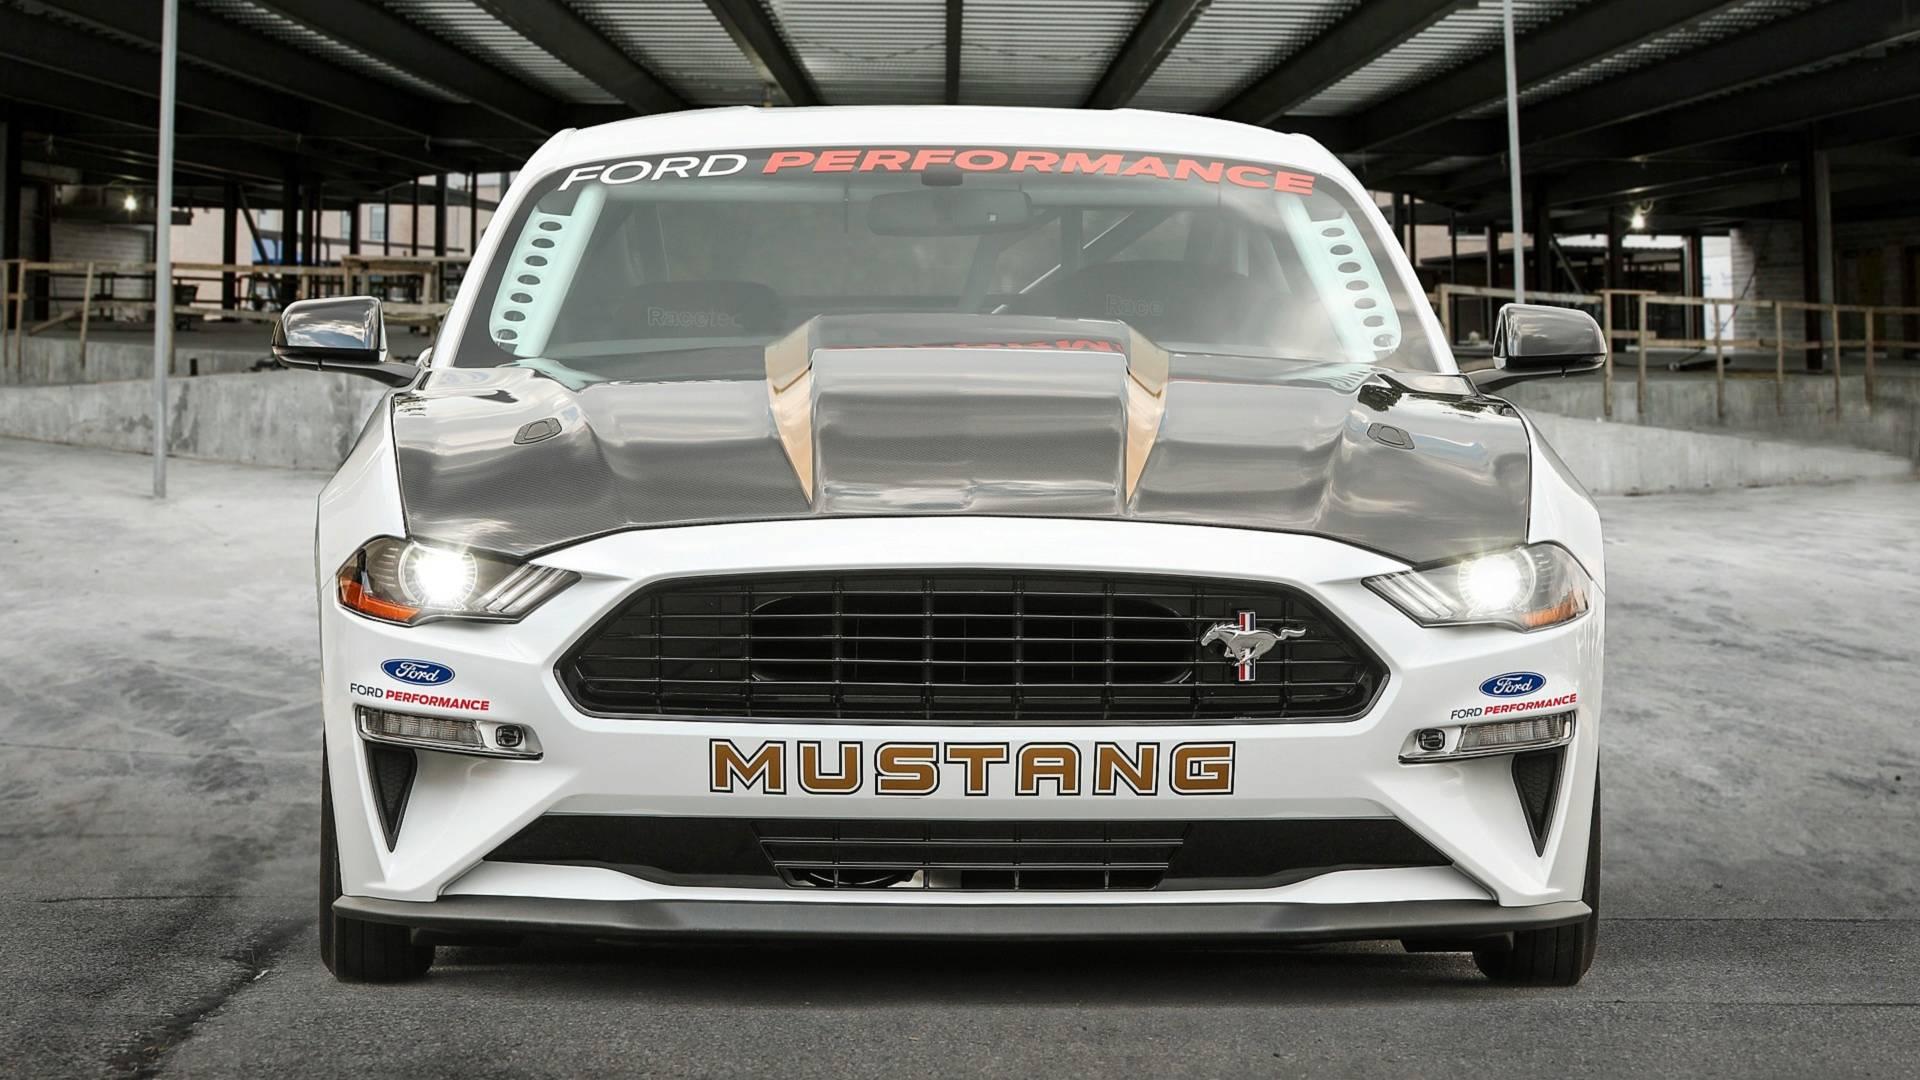 Ford Mustang Cobra Jet Is An 8-Second Quarter-Mile Demon Killer